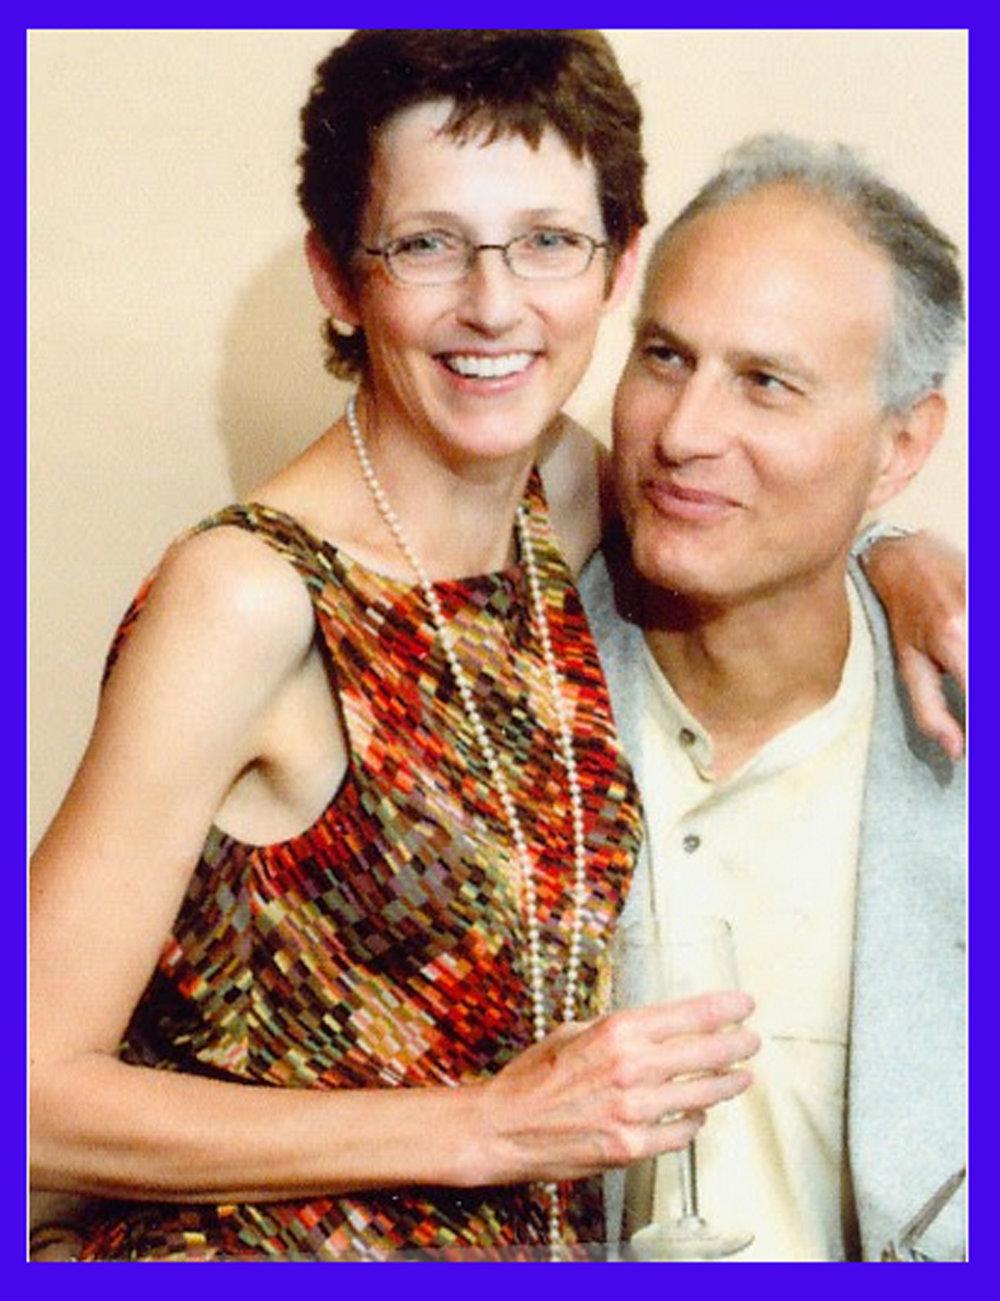 My beautiful wife Tracy Seeley 4/6/1957 – 7/7/2016